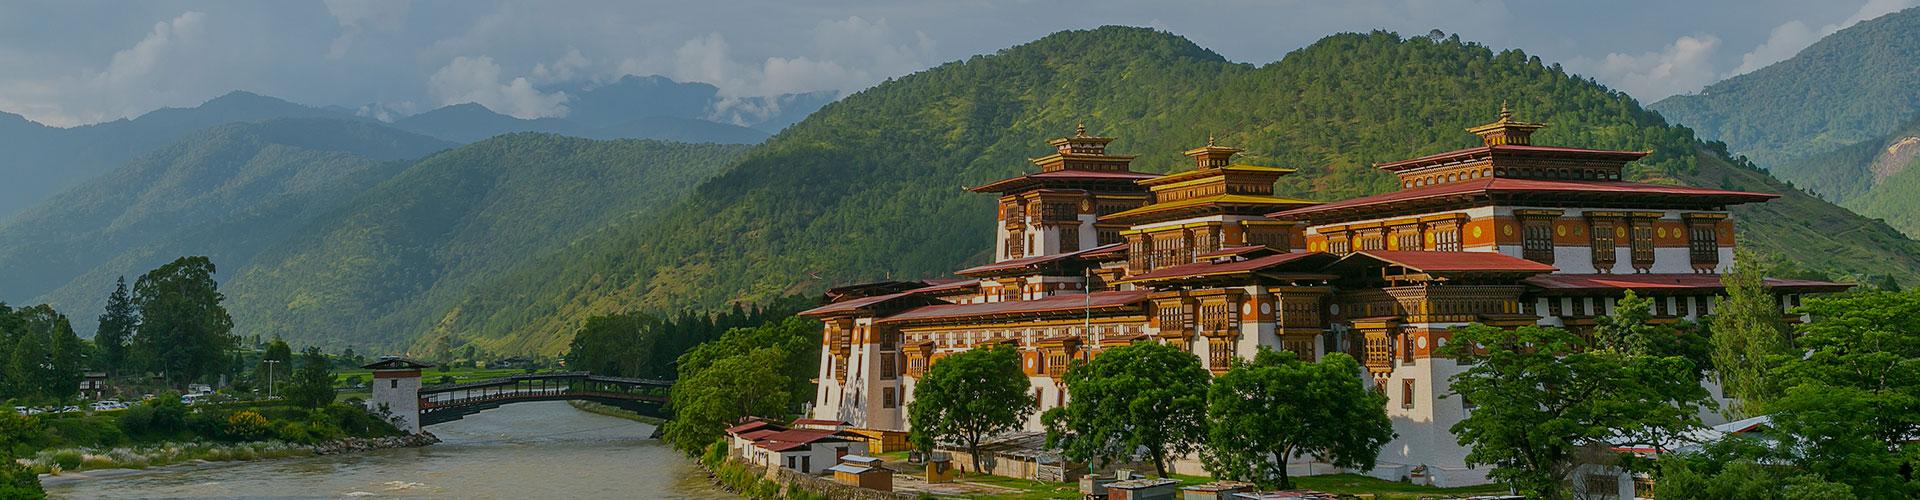 Landmark photograph of Bhutan